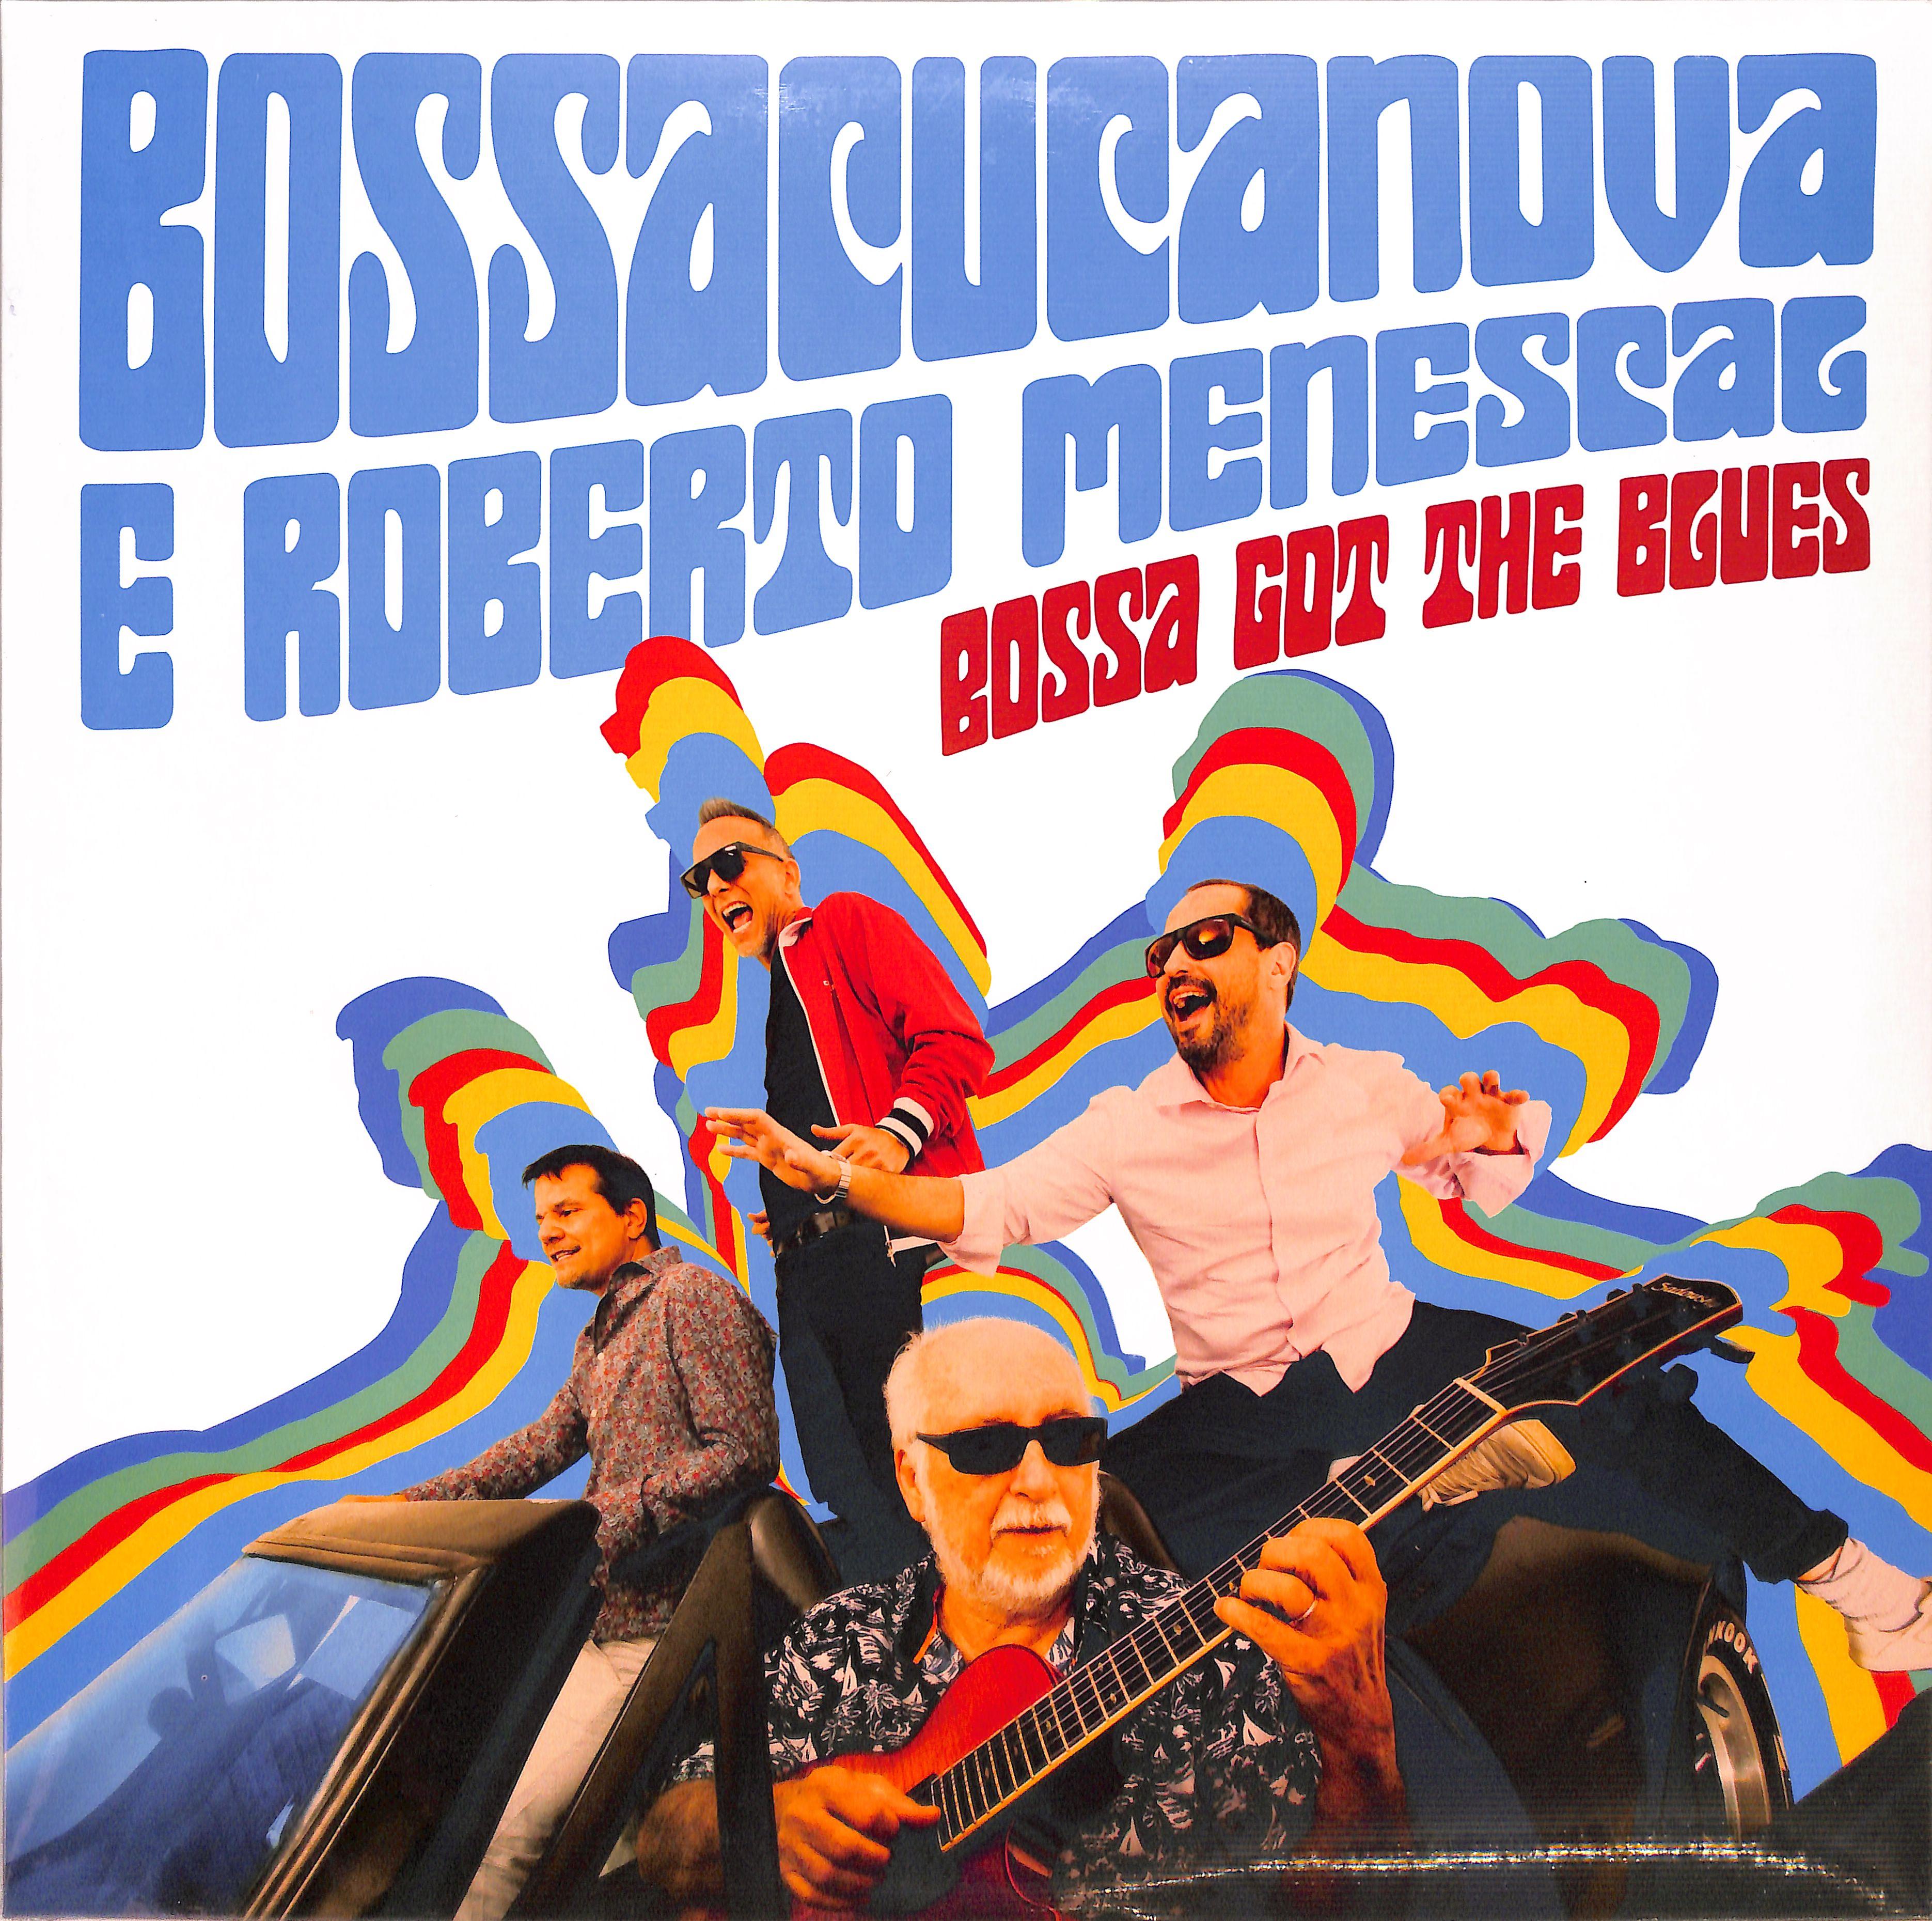 Bossacucanova & Roberto Menescal - BOSSA GOT THE BLUES